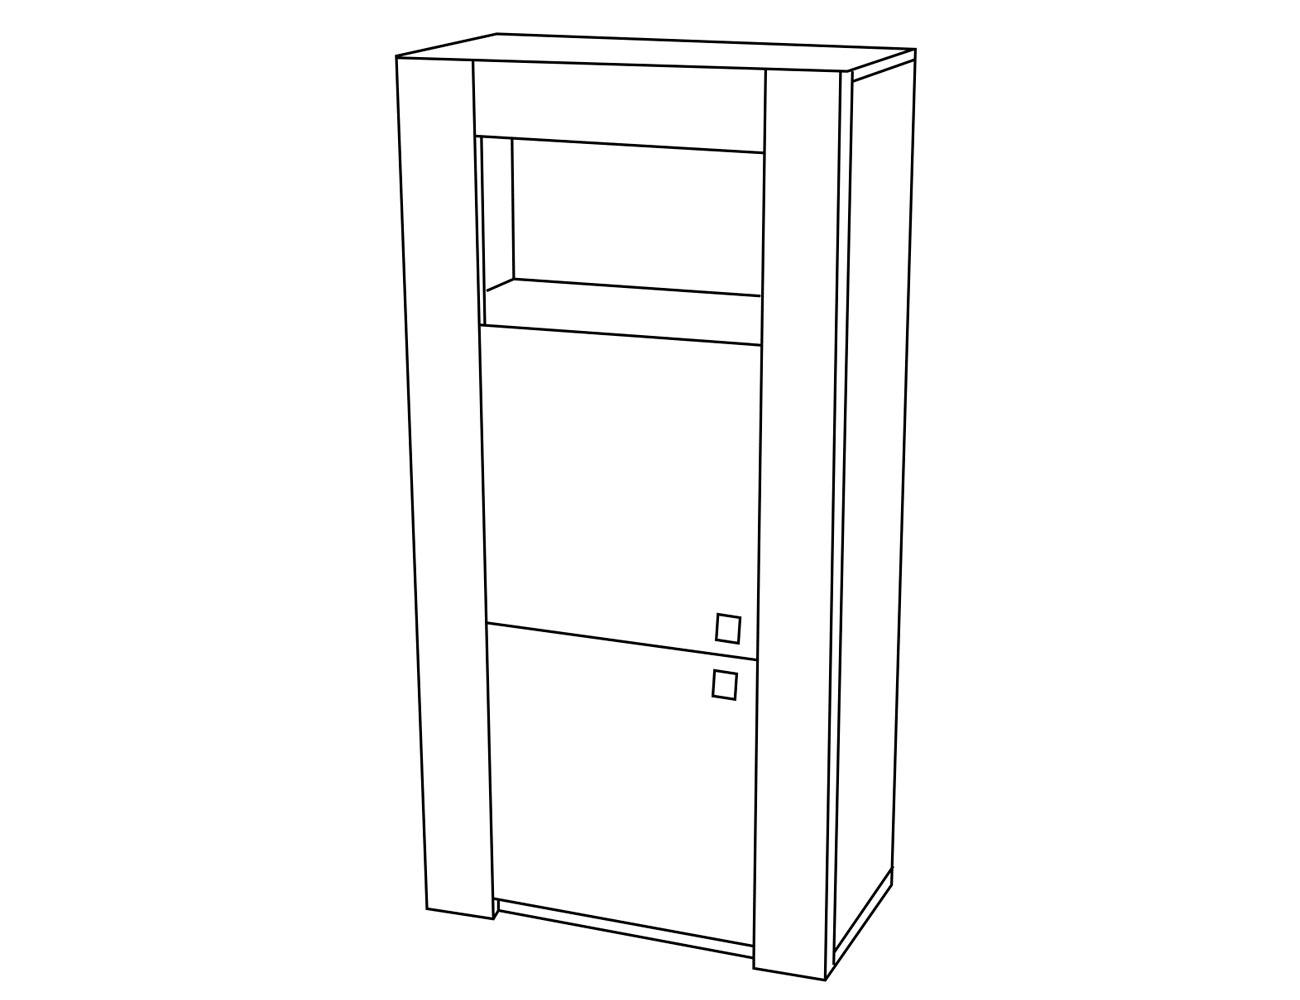 Bodeguero 1 p madera+hueco 72x37x145